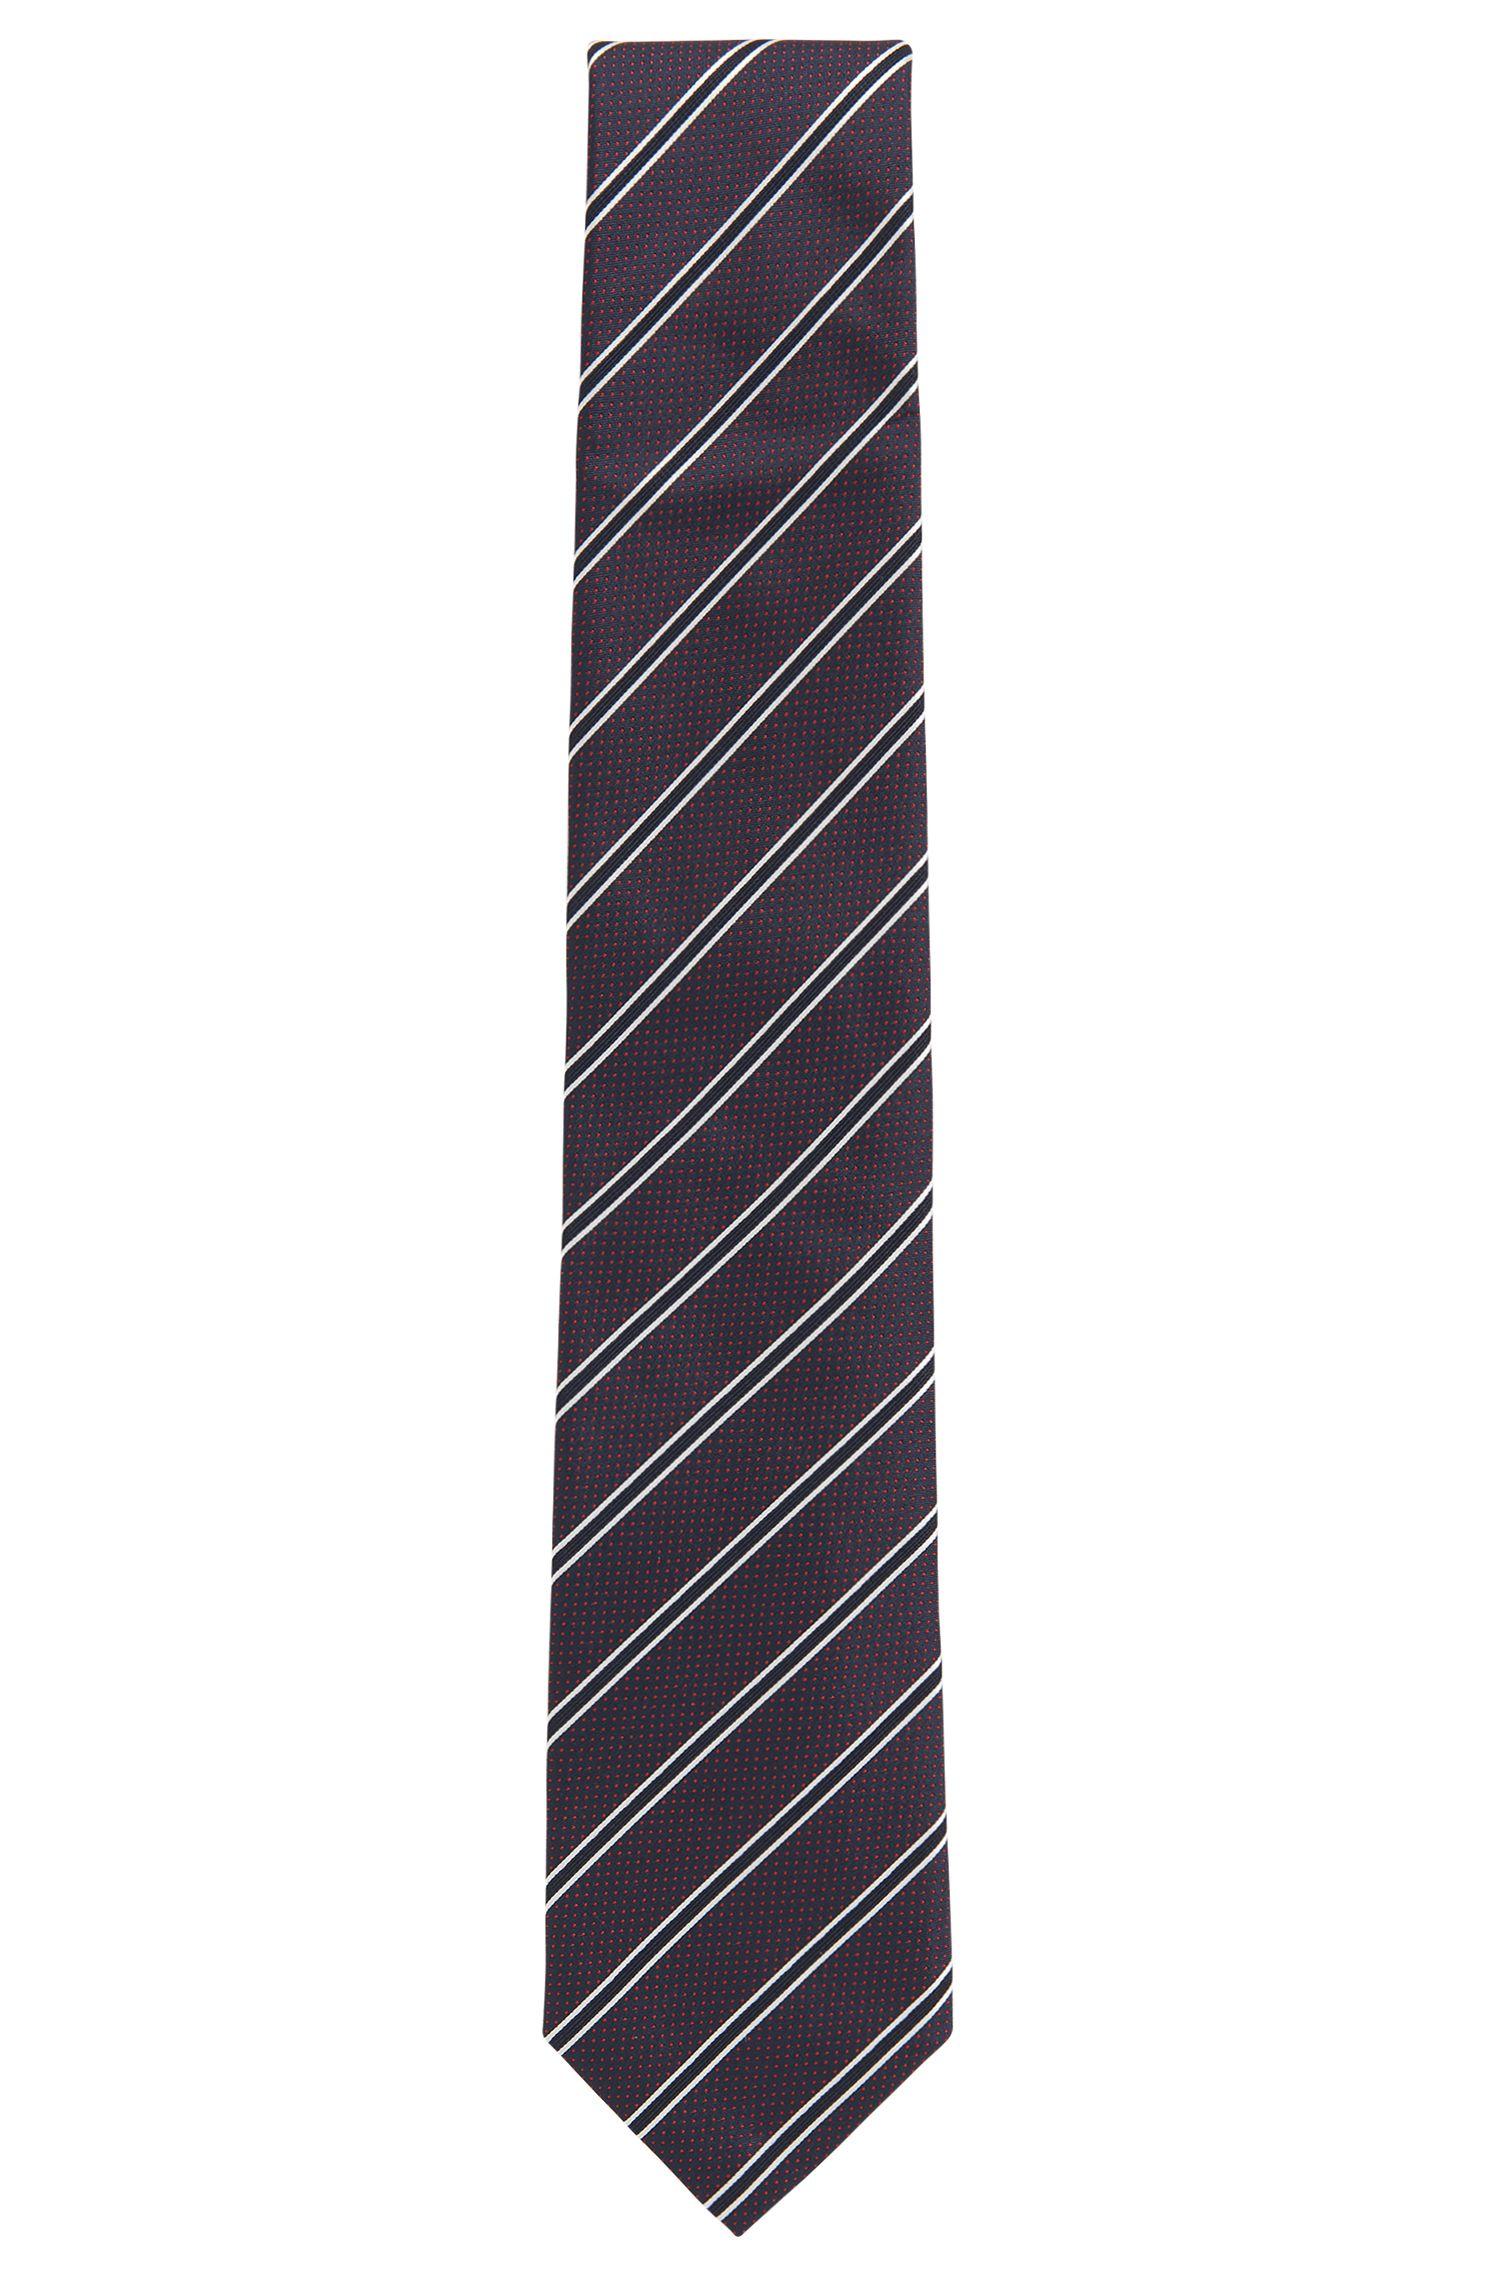 Striped Italian Silk Tie, Dark pink